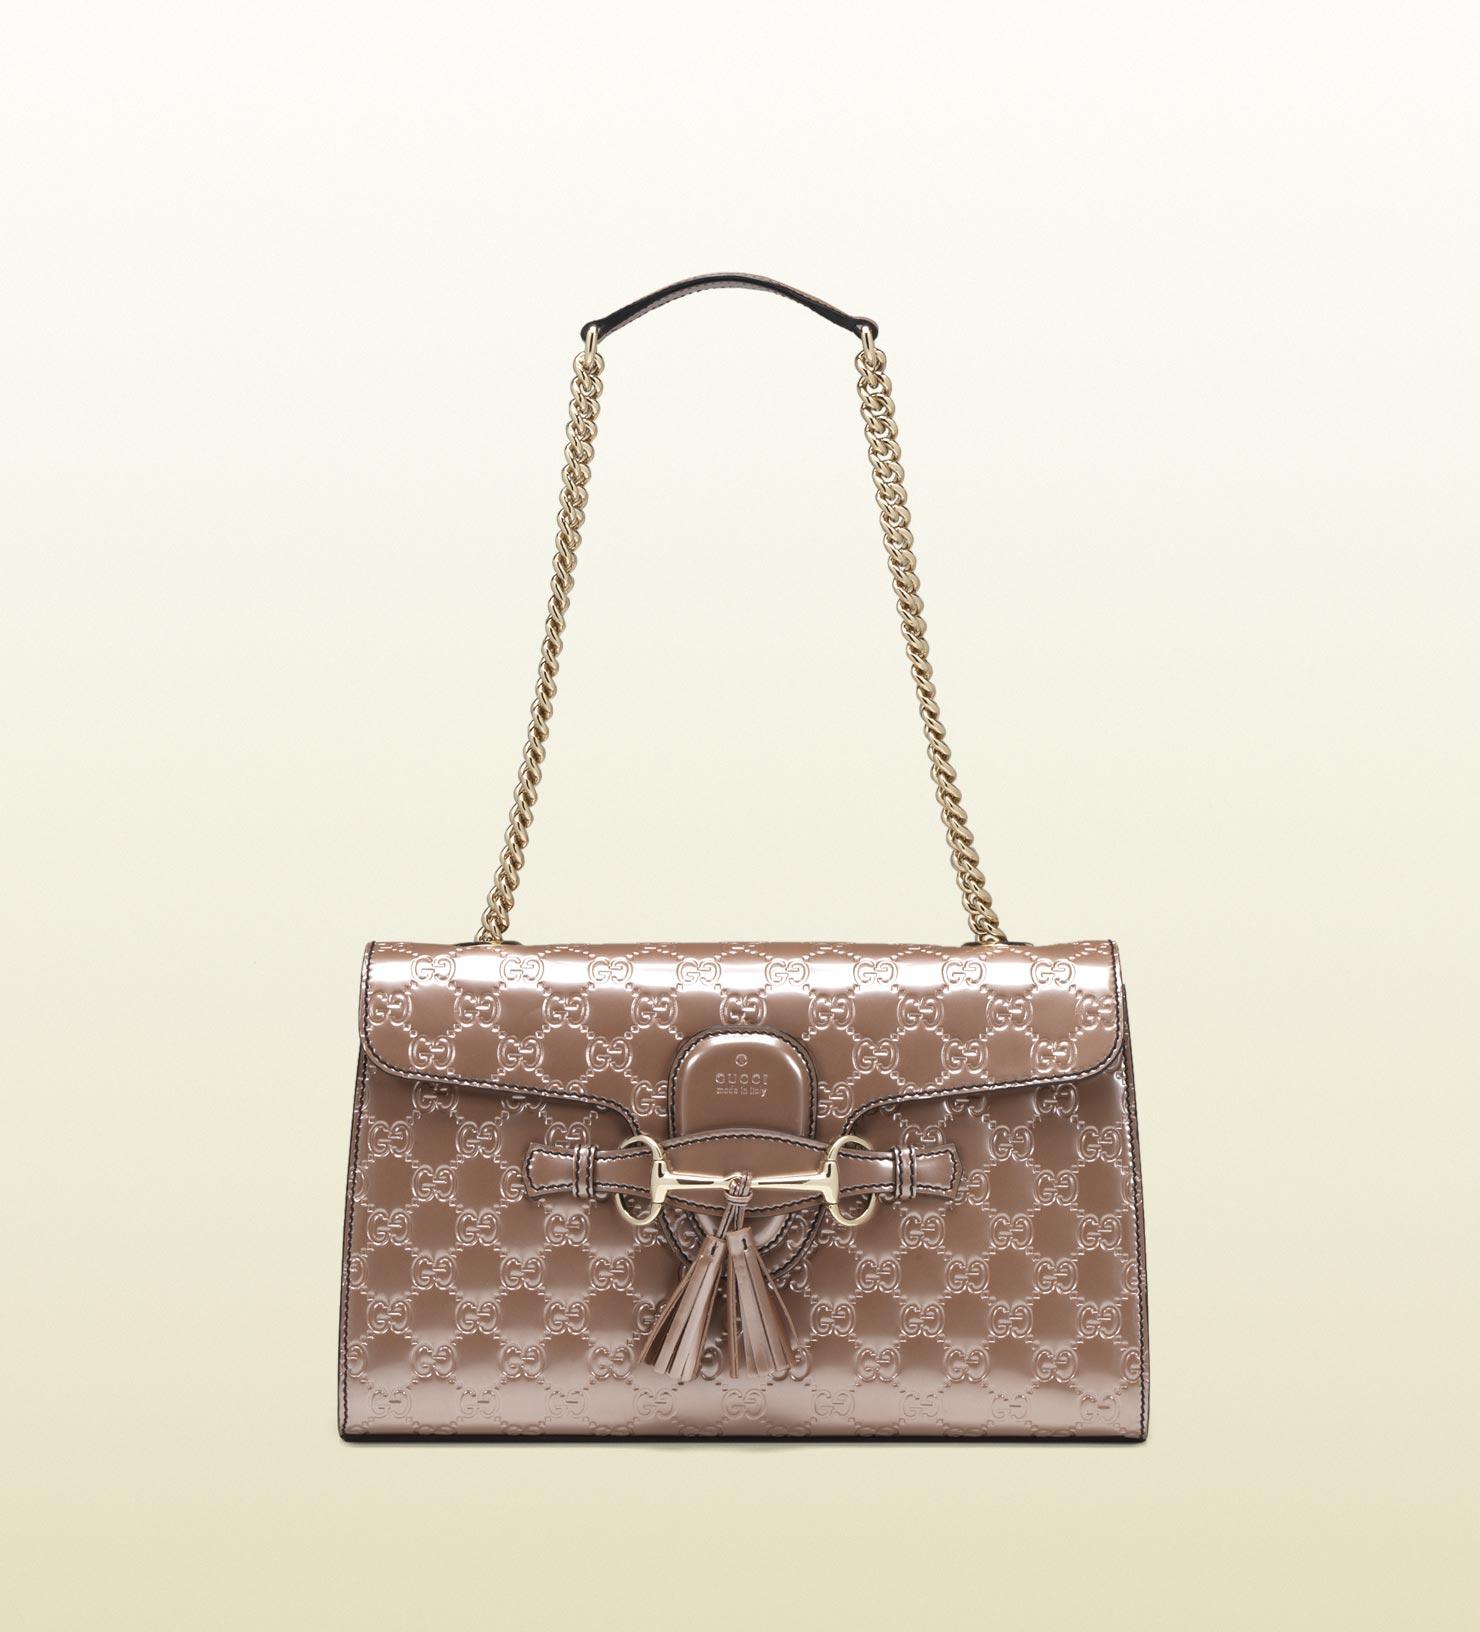 8cf558dc9e4e Gucci Emily Light Pink Shiny Microguccissima Chain Shoulder Bag in ...